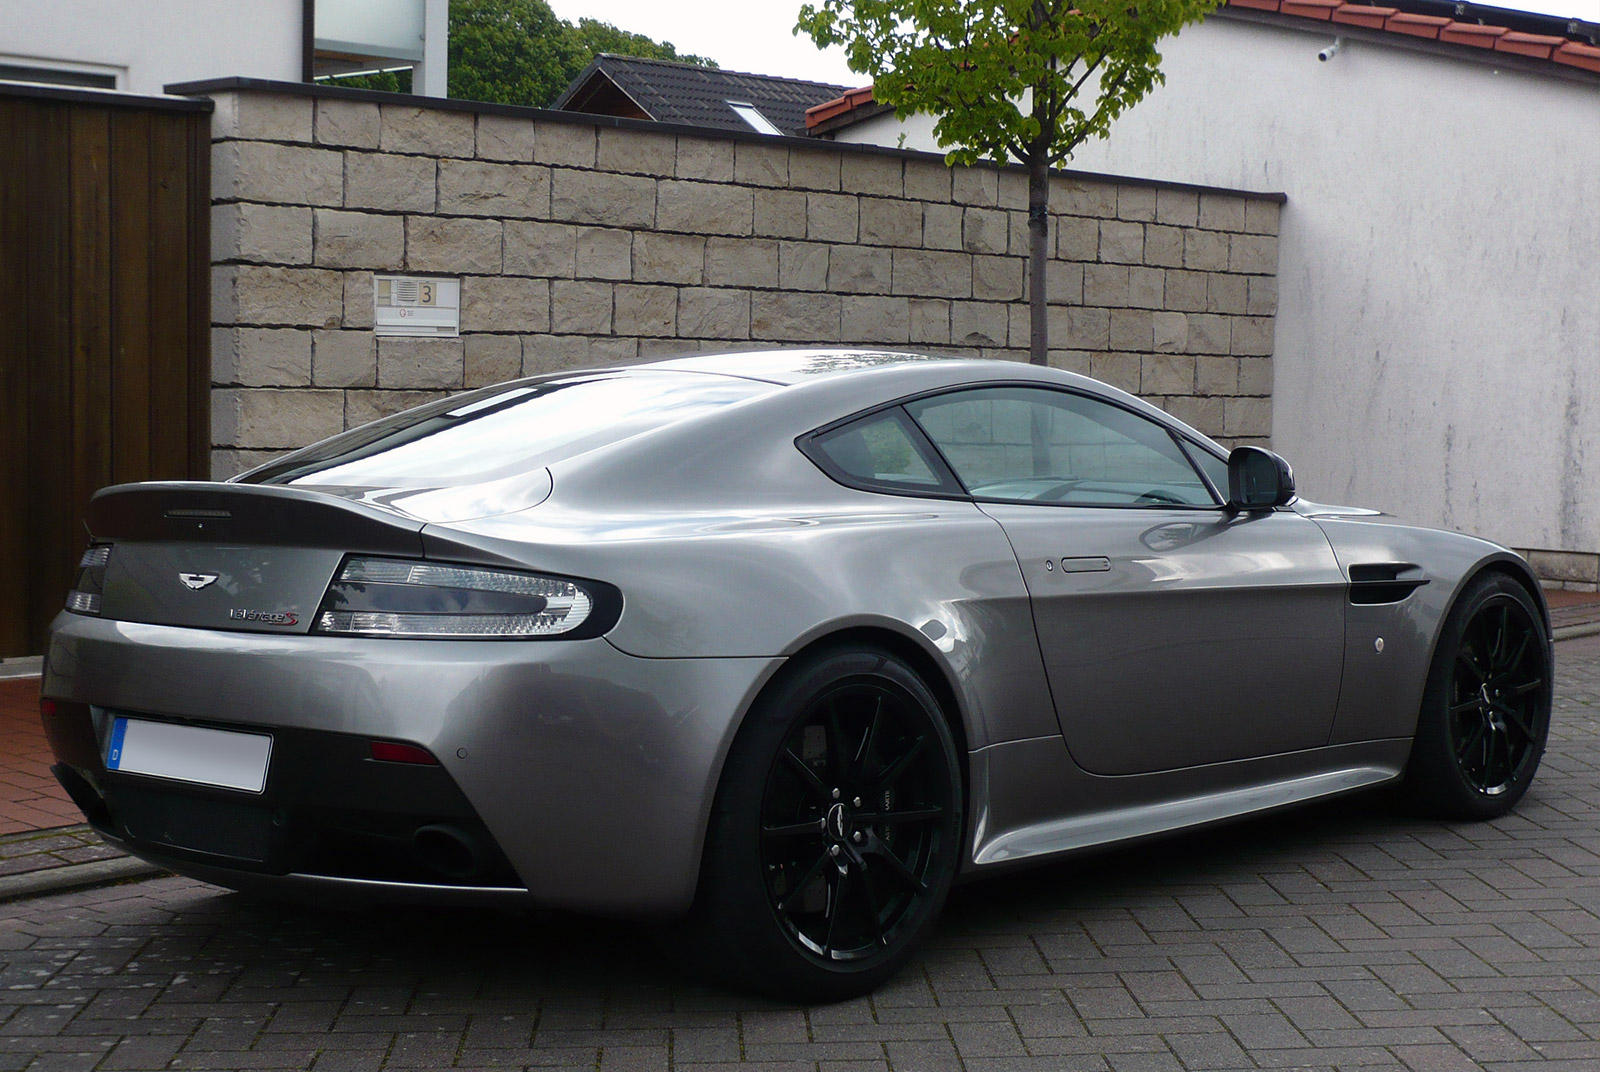 AM-2995-Aston-Martin_V12-Vantage-S_Grau_Schwarz_02